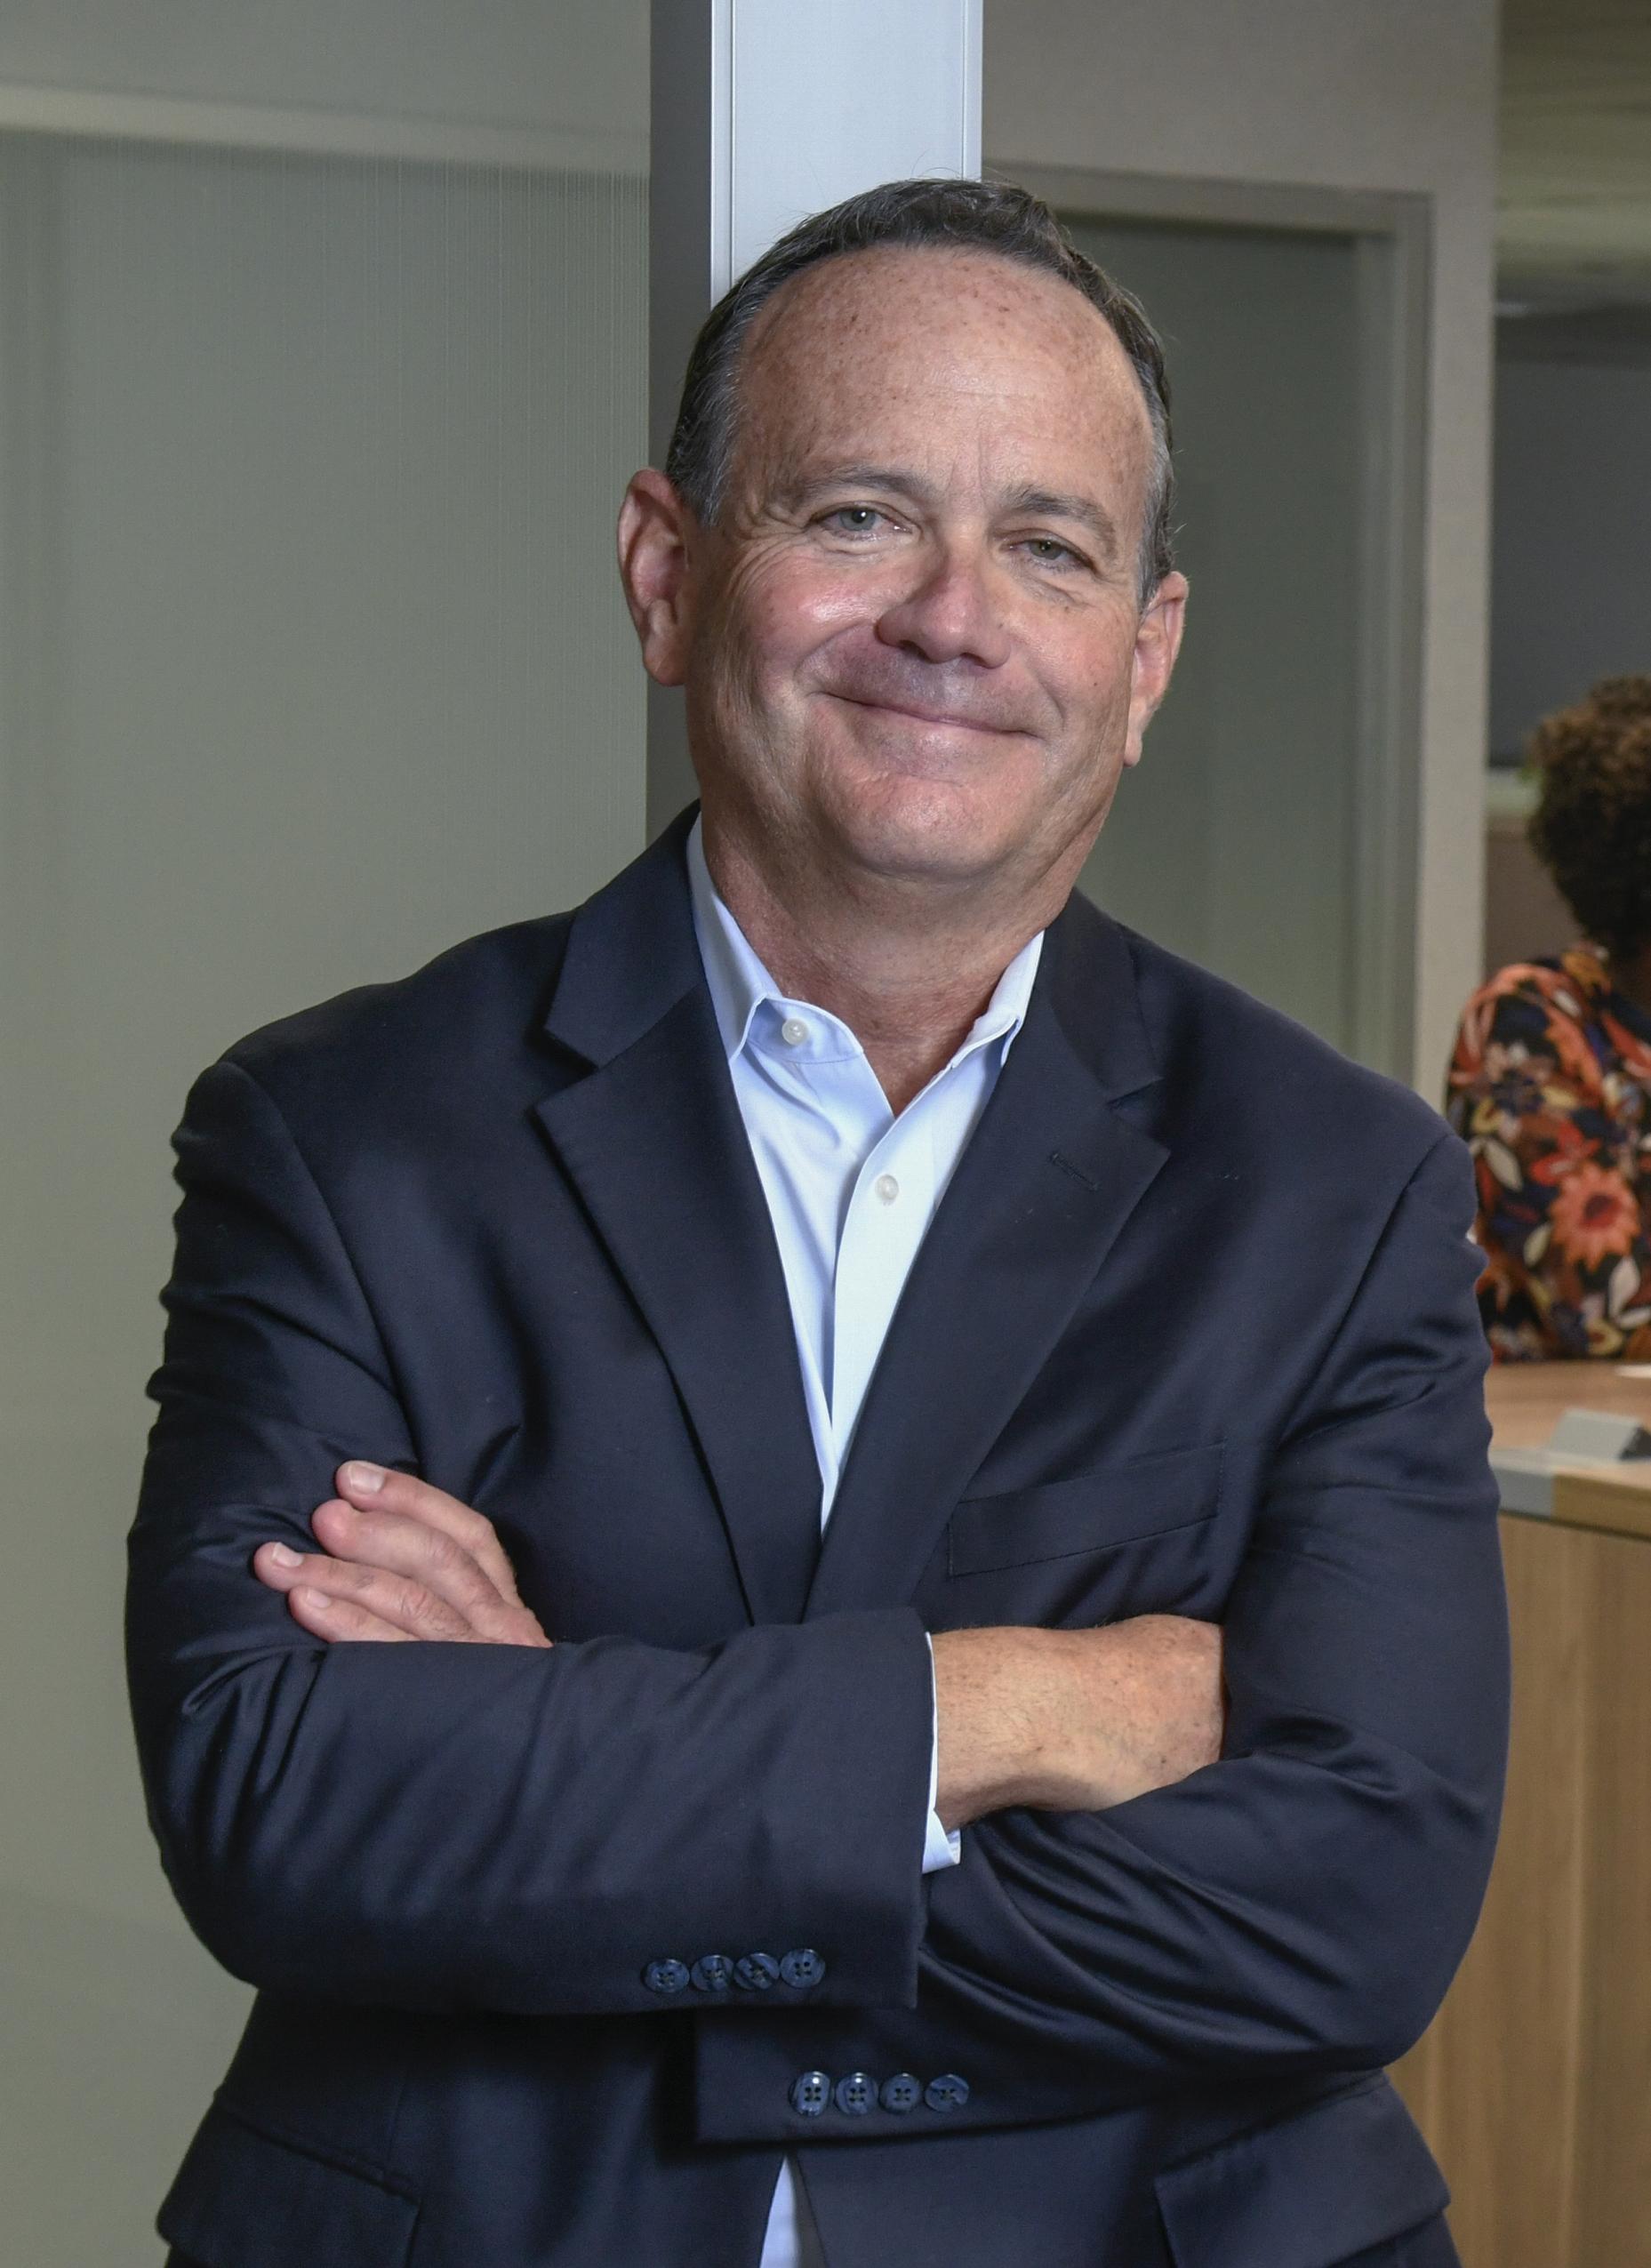 Mike Skaggs TVA